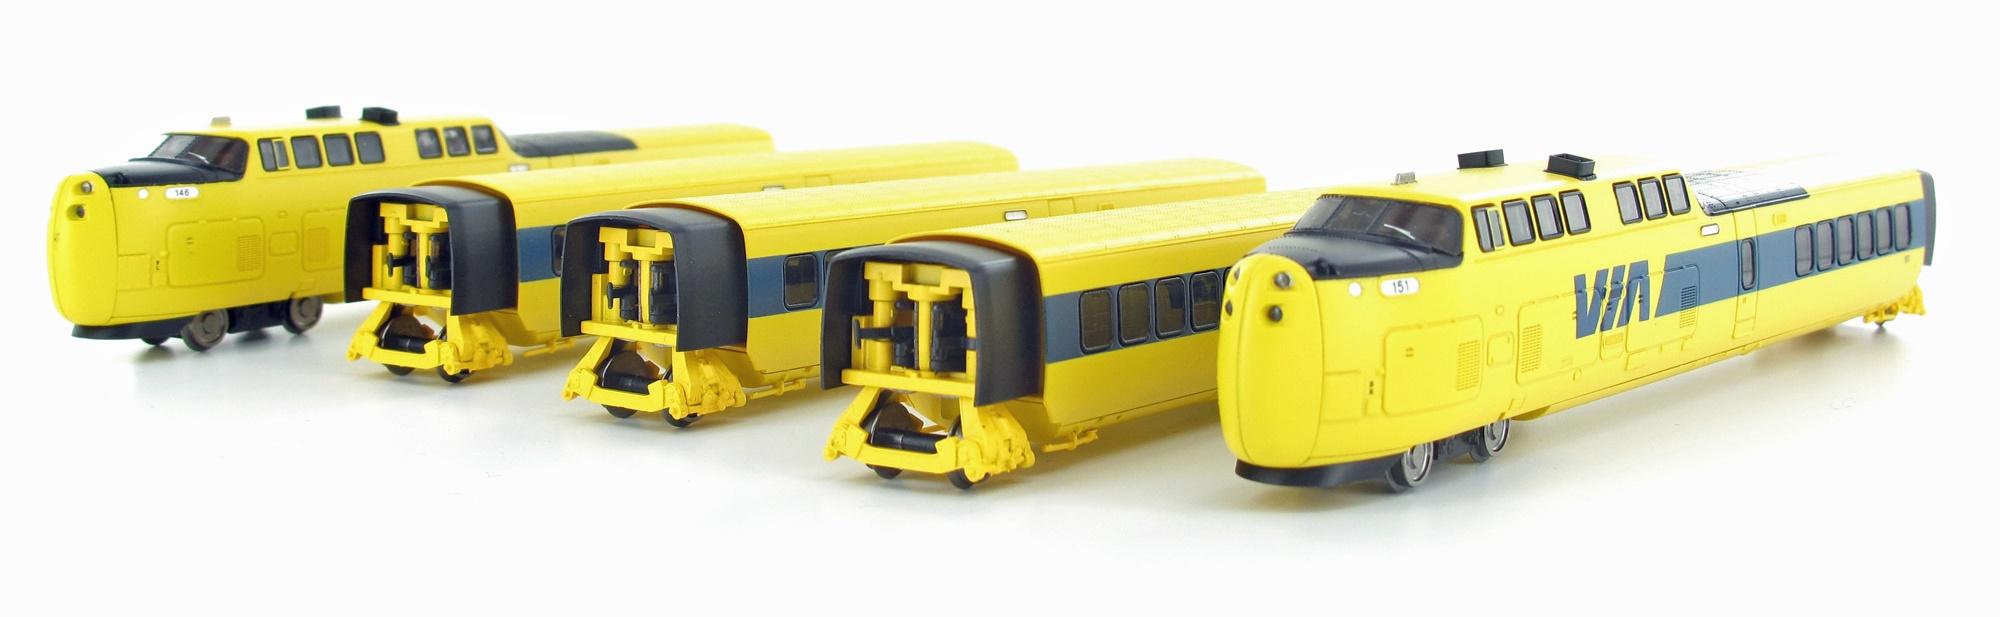 N Scale - Rapido Trains - 520006 - Passenger Train, TurboTrain - Via Rail Canada